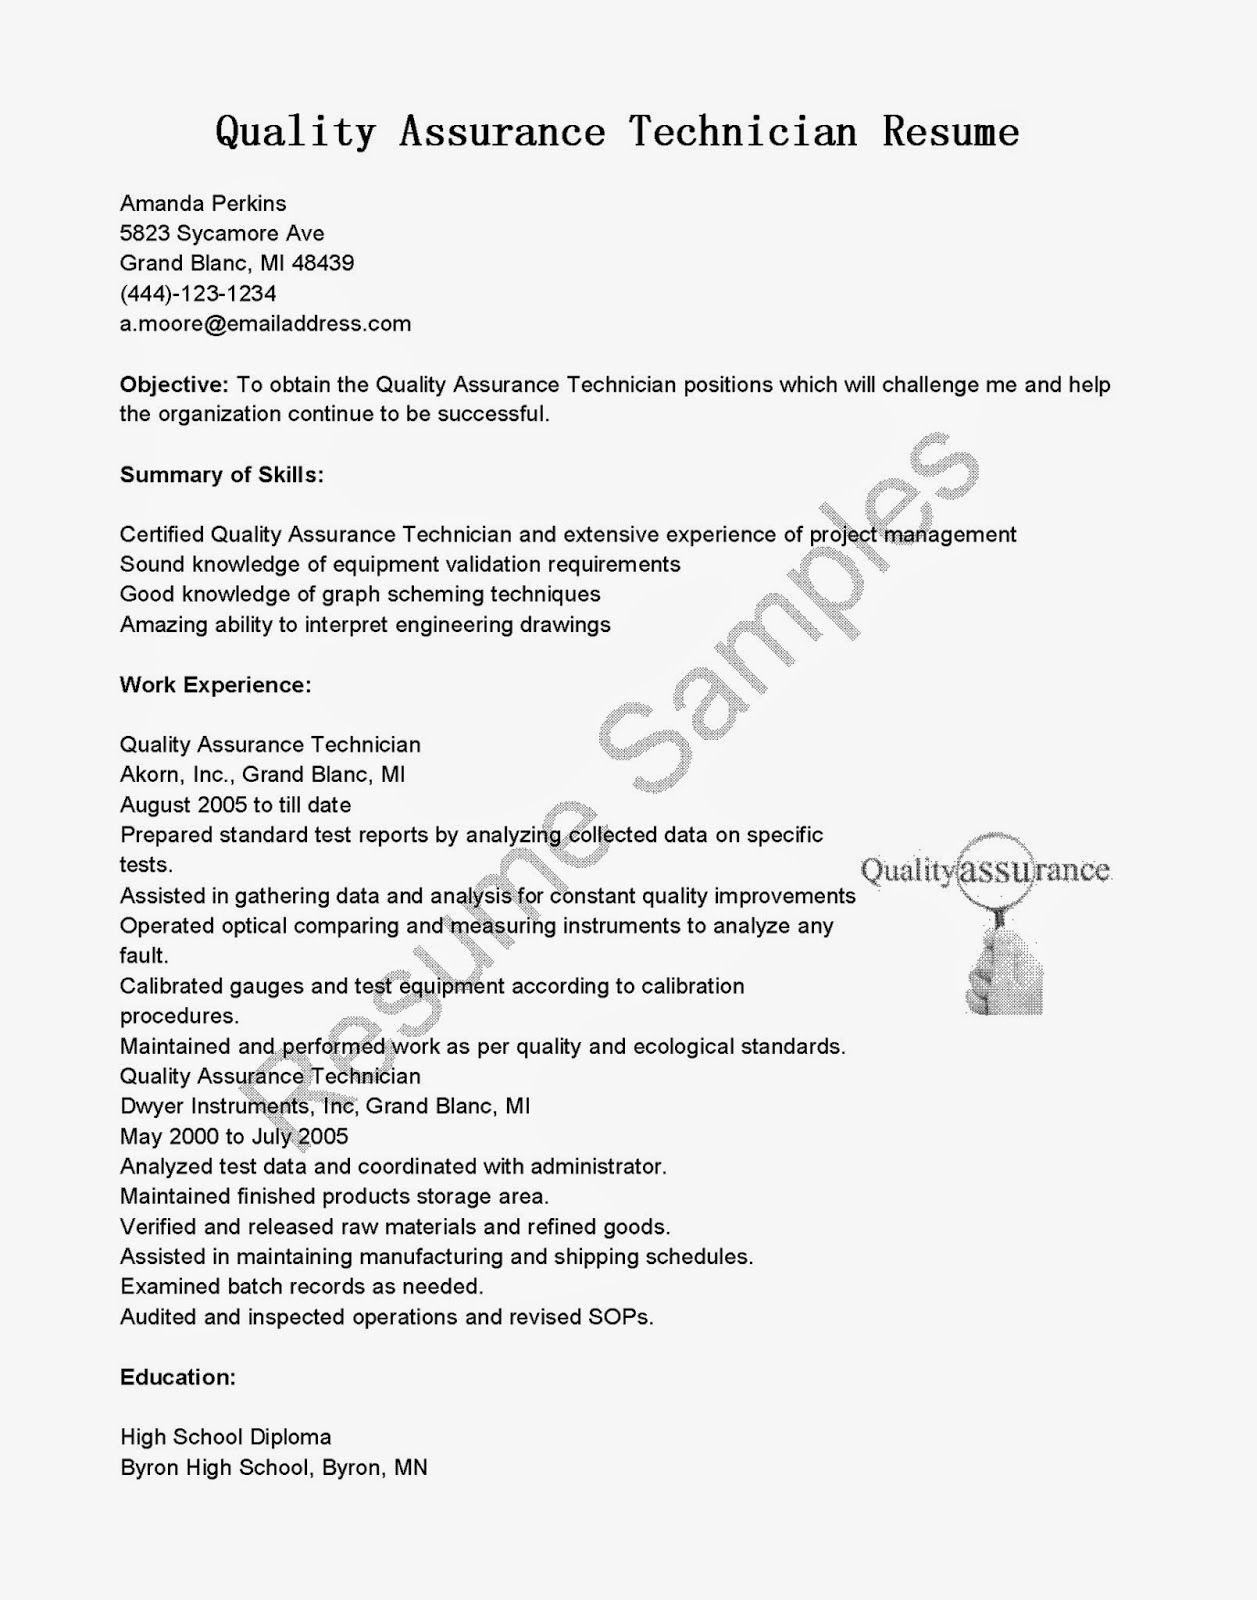 Resume Format Quality Assurance Pharma Resume Format Resume Skills Resume Objective Examples Resume Examples